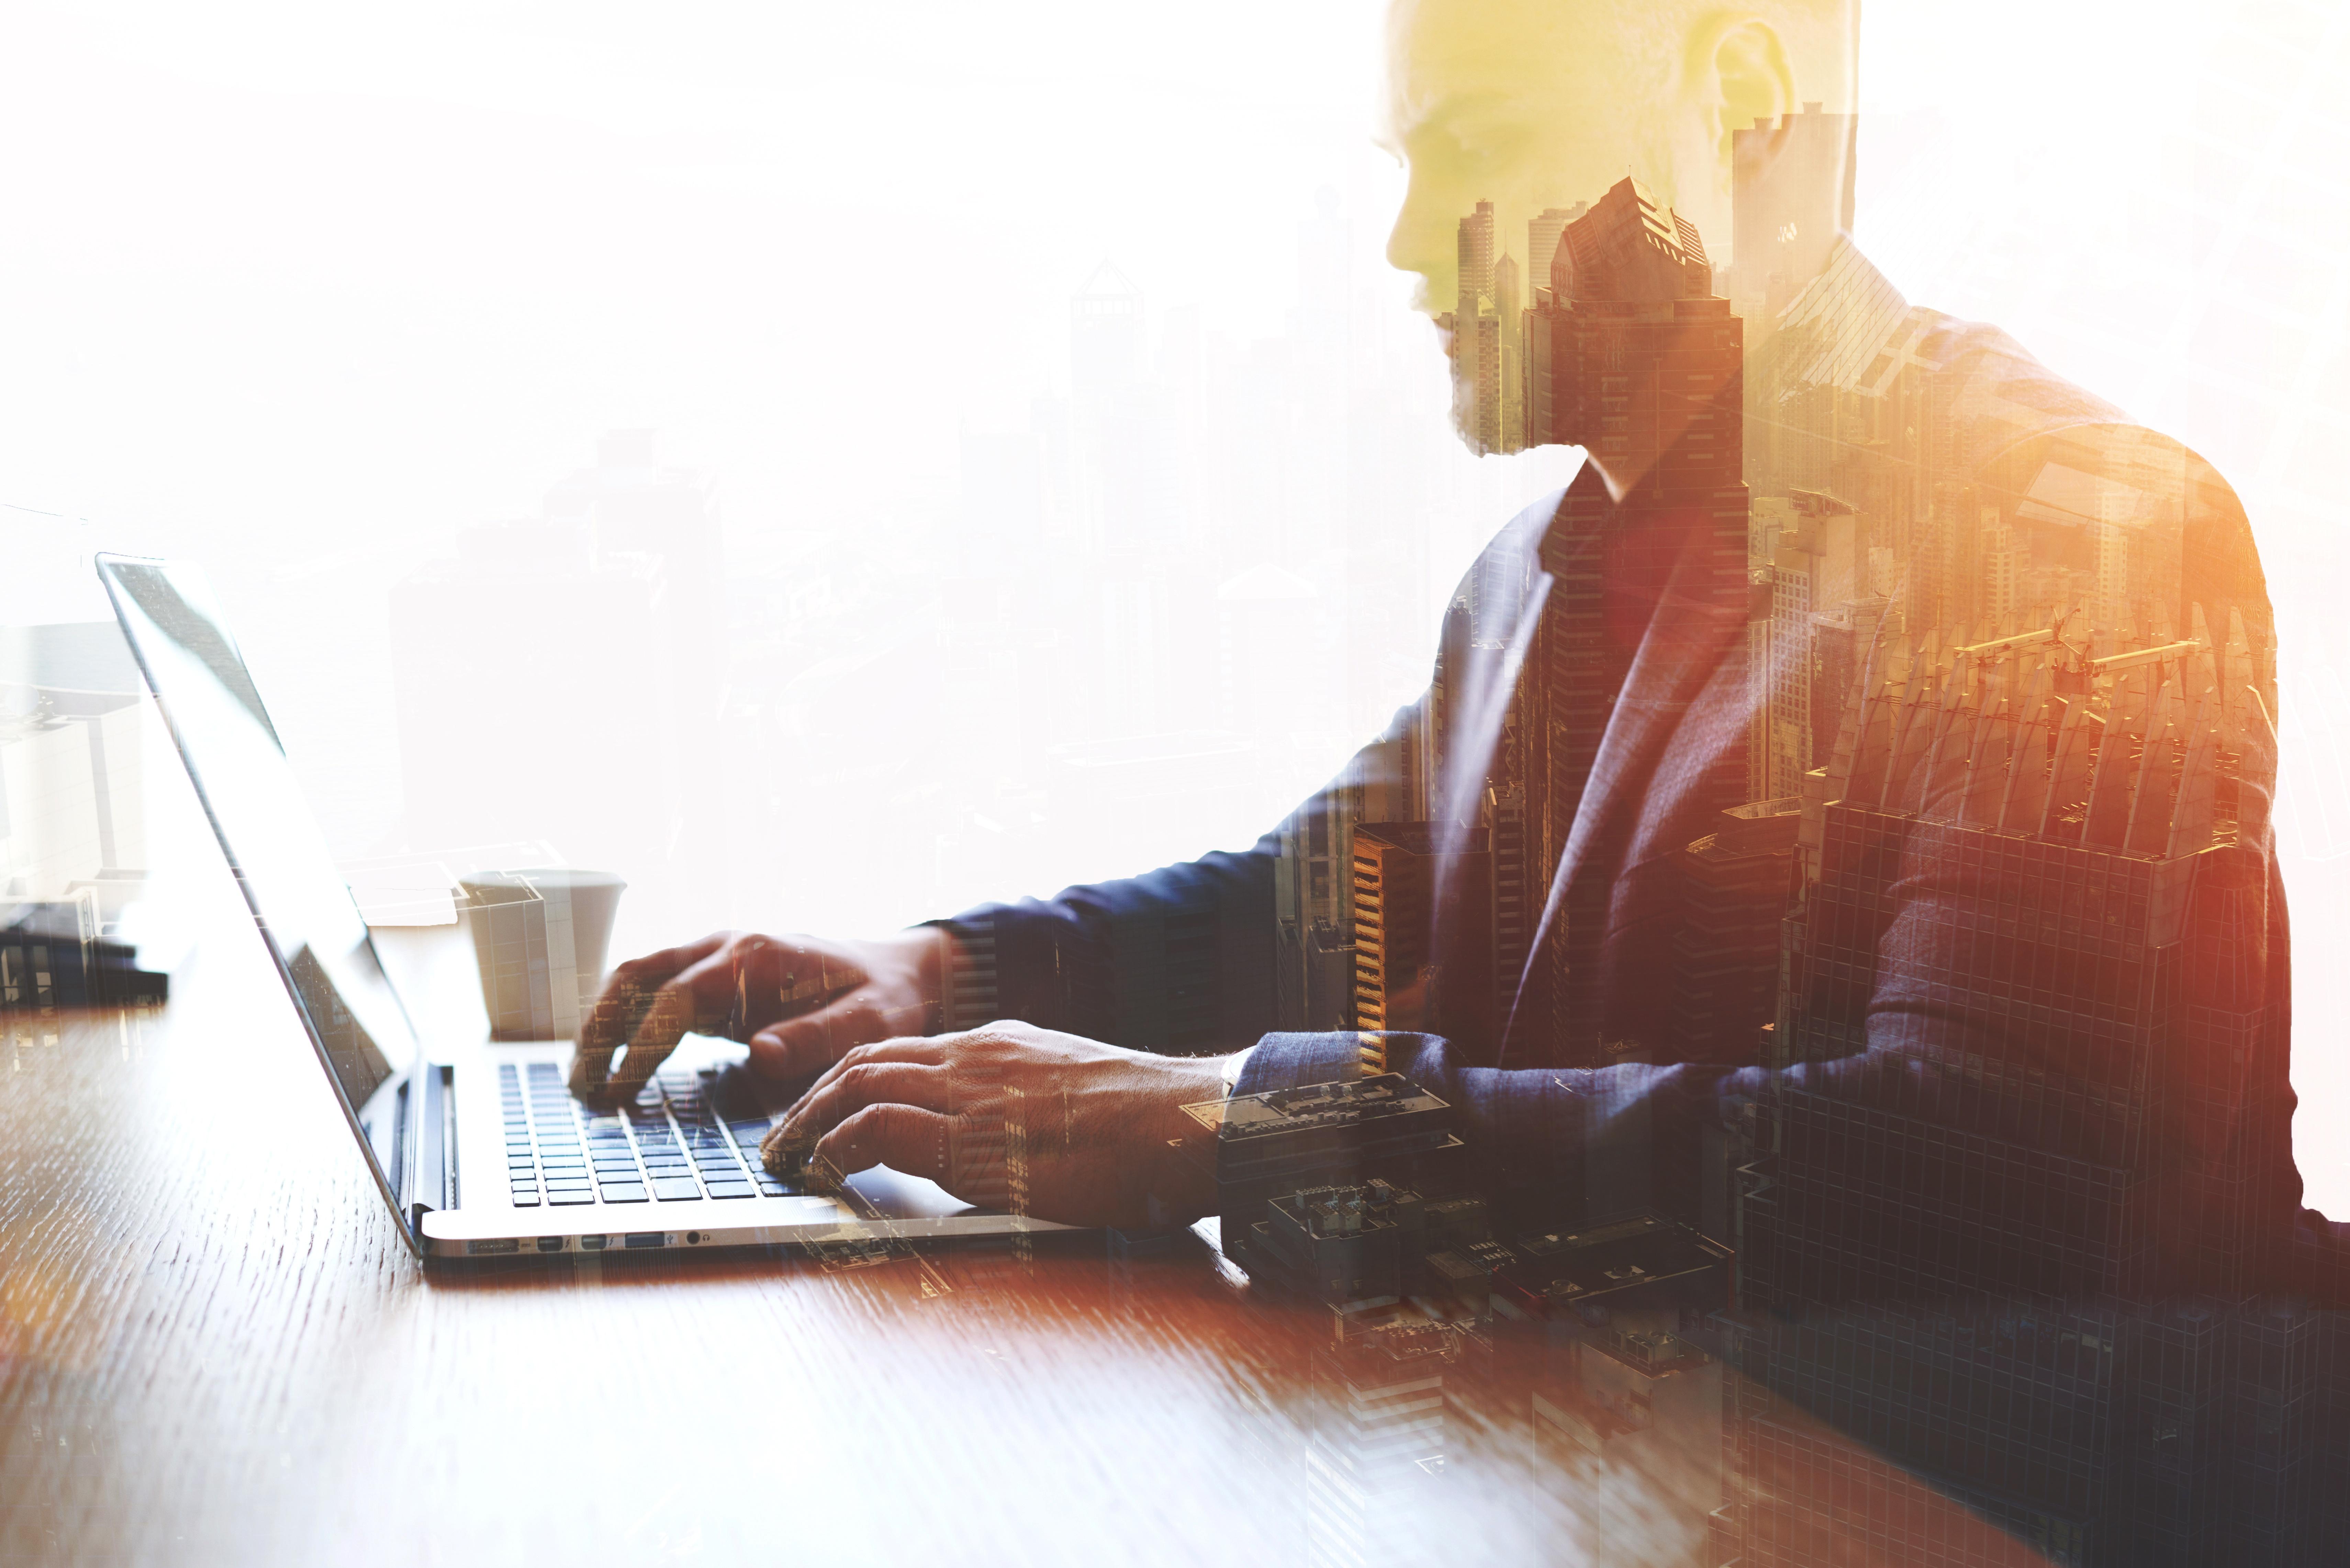 Online 401k Company, online 401k, the online 401k